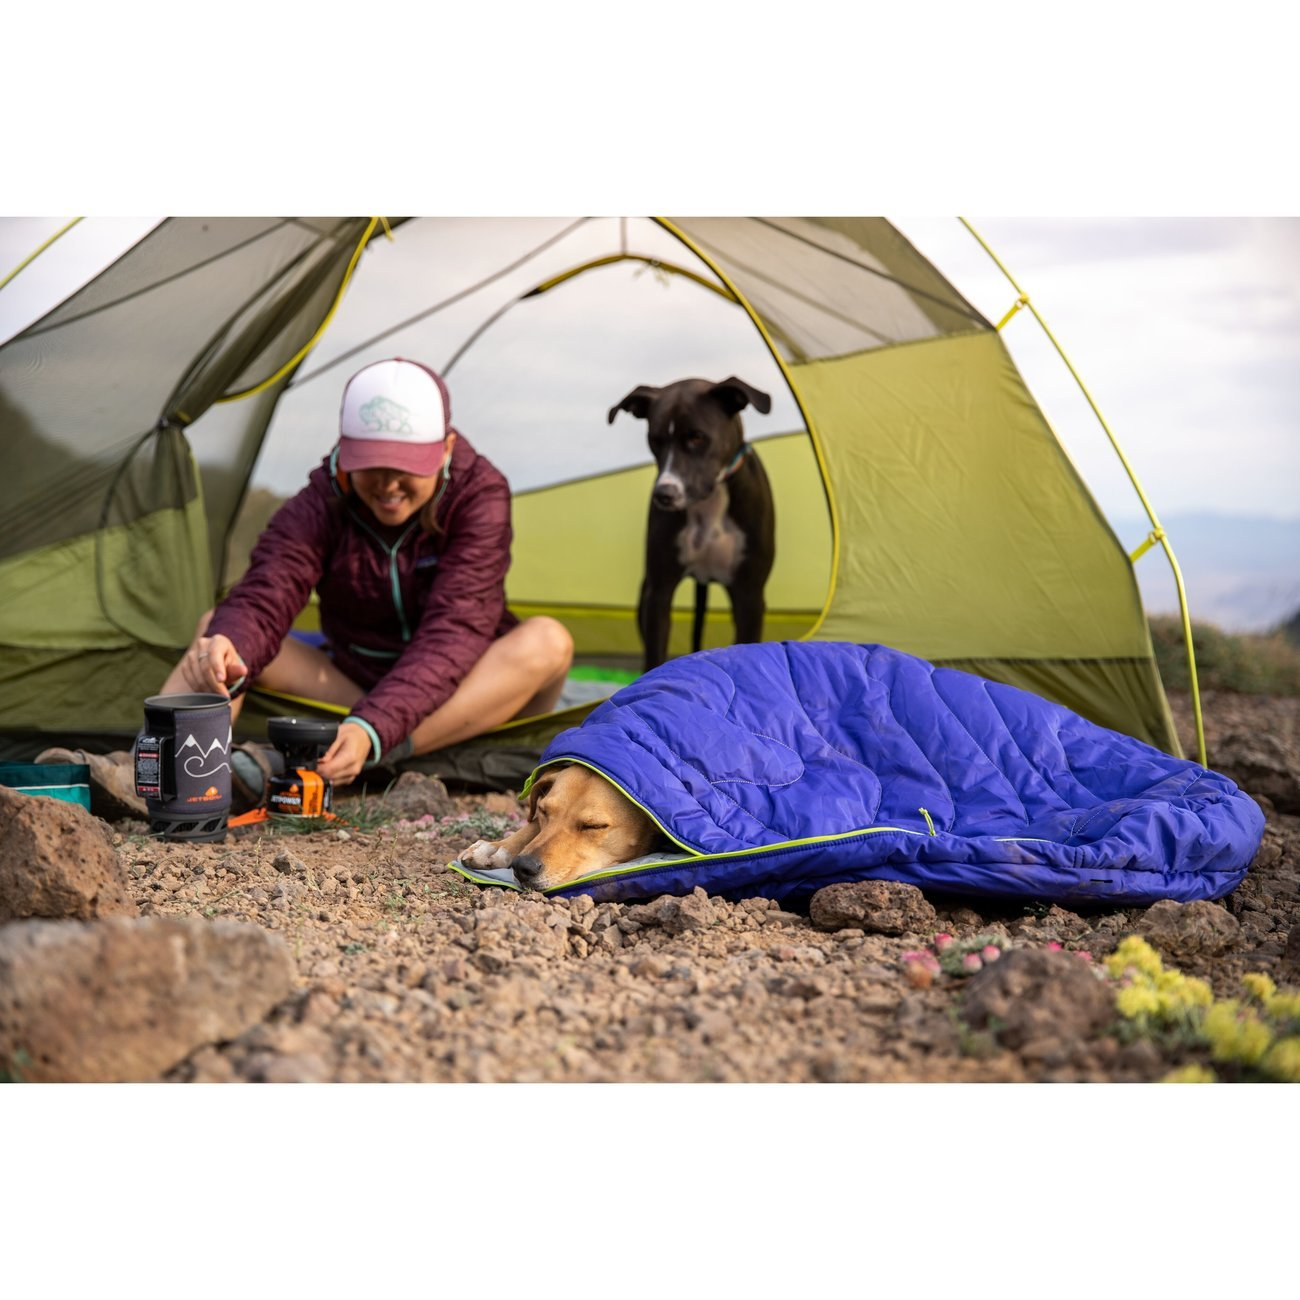 Ruffwear Highlands Sleeping Bag™ Schlafsack für Hunde, Bild 16